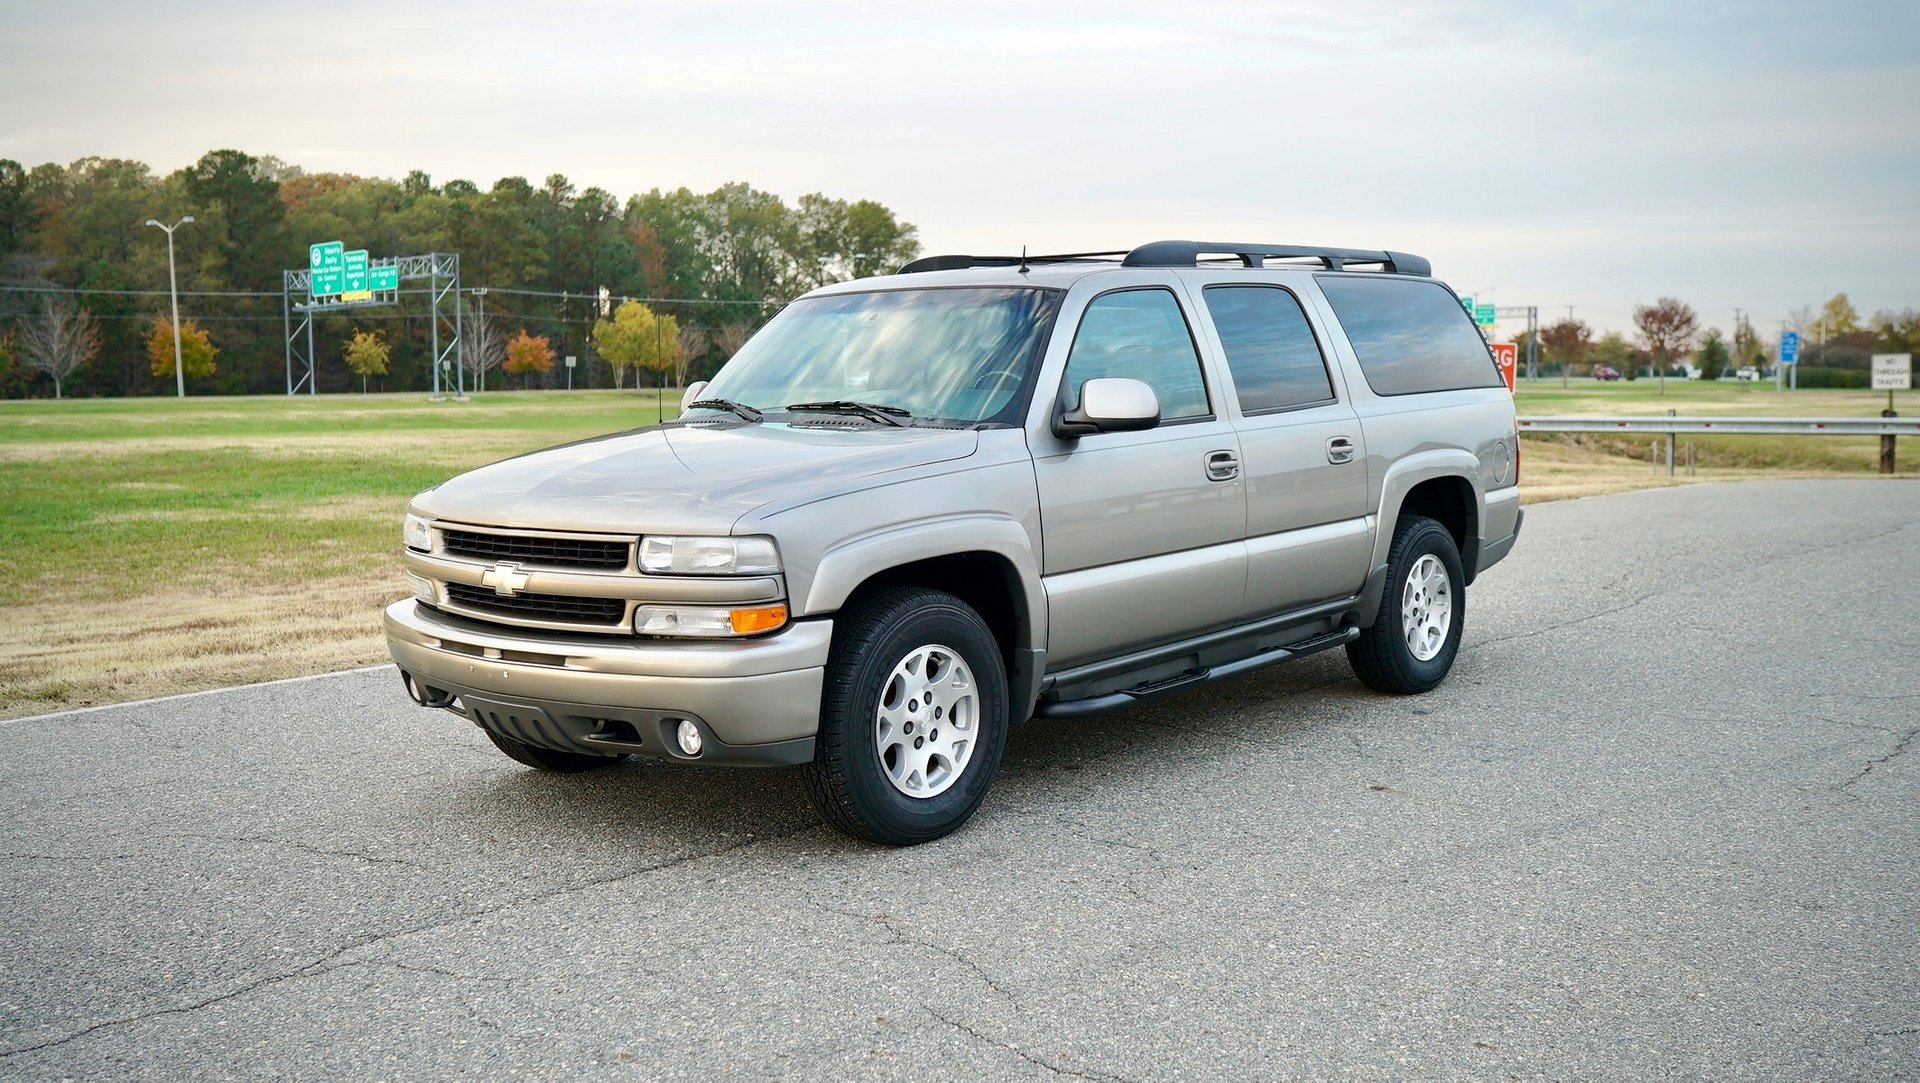 2002 chevrolet suburban 4dr 1500 4wd z71